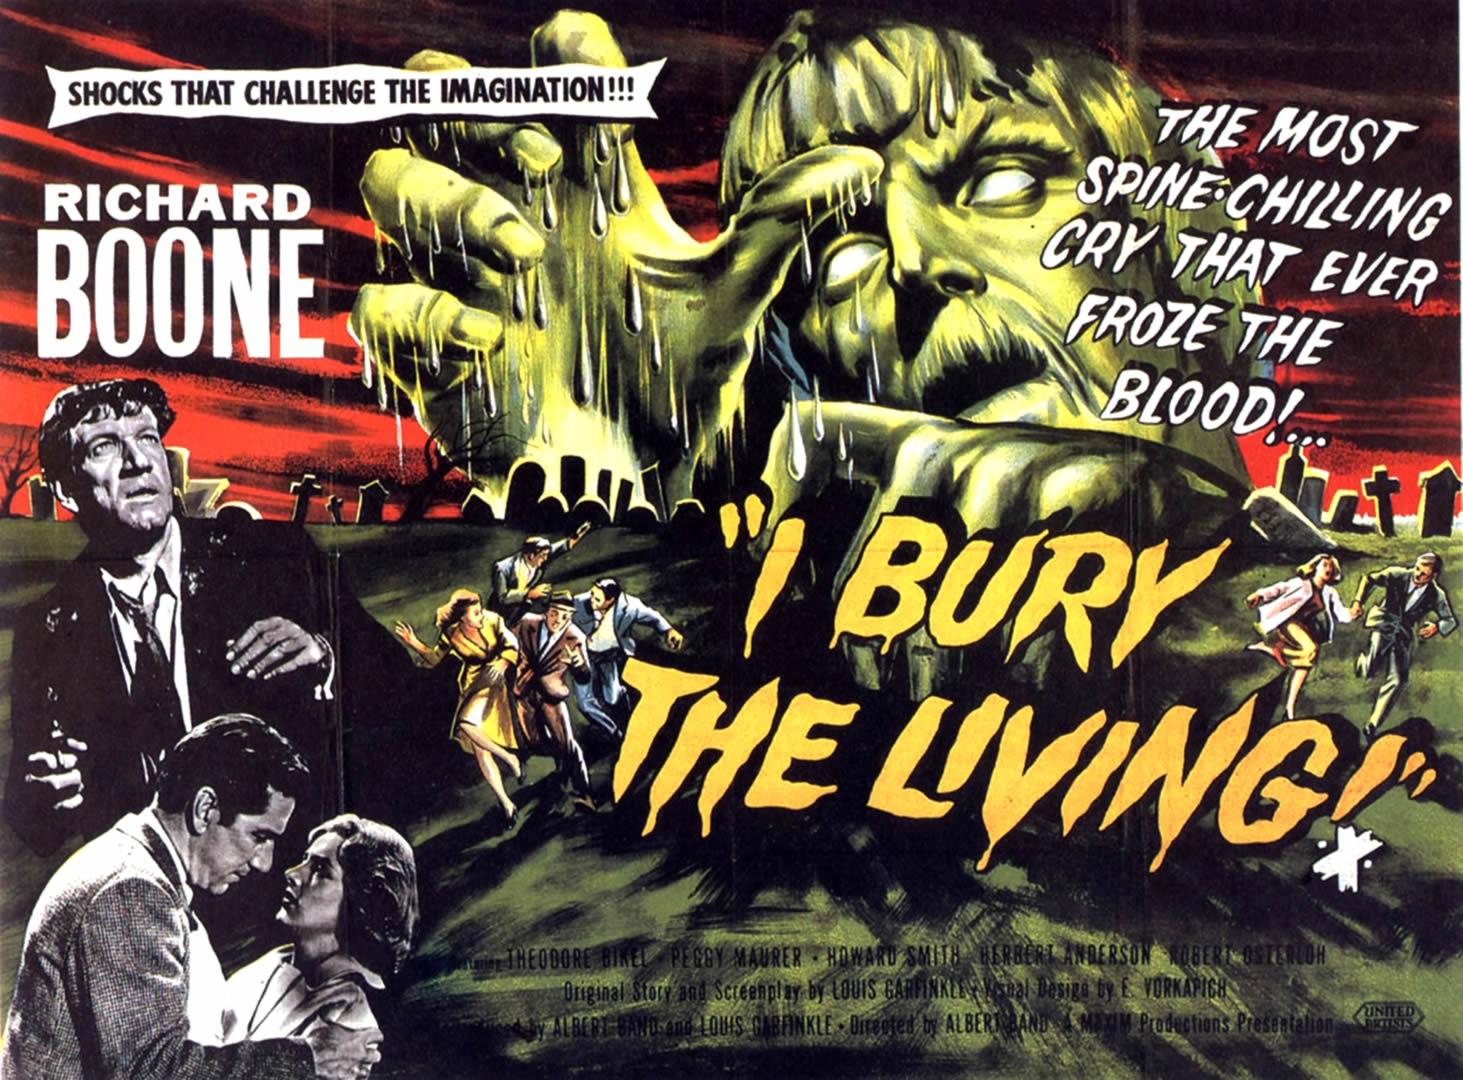 I BURY THE LIVING (1958) poster